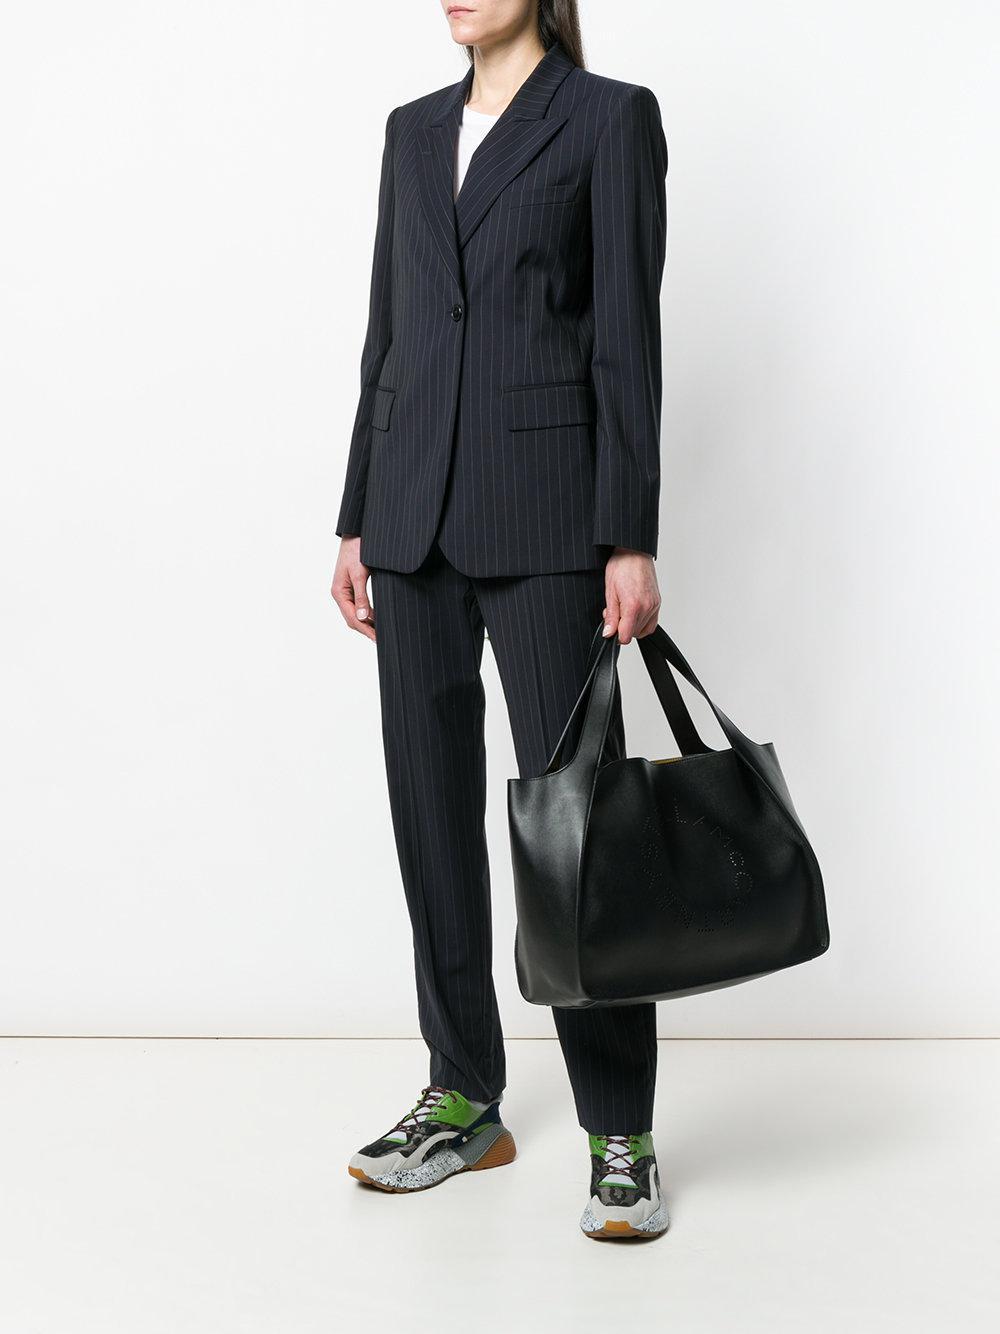 Stella McCartney Stella Logo Tote Bag in Black